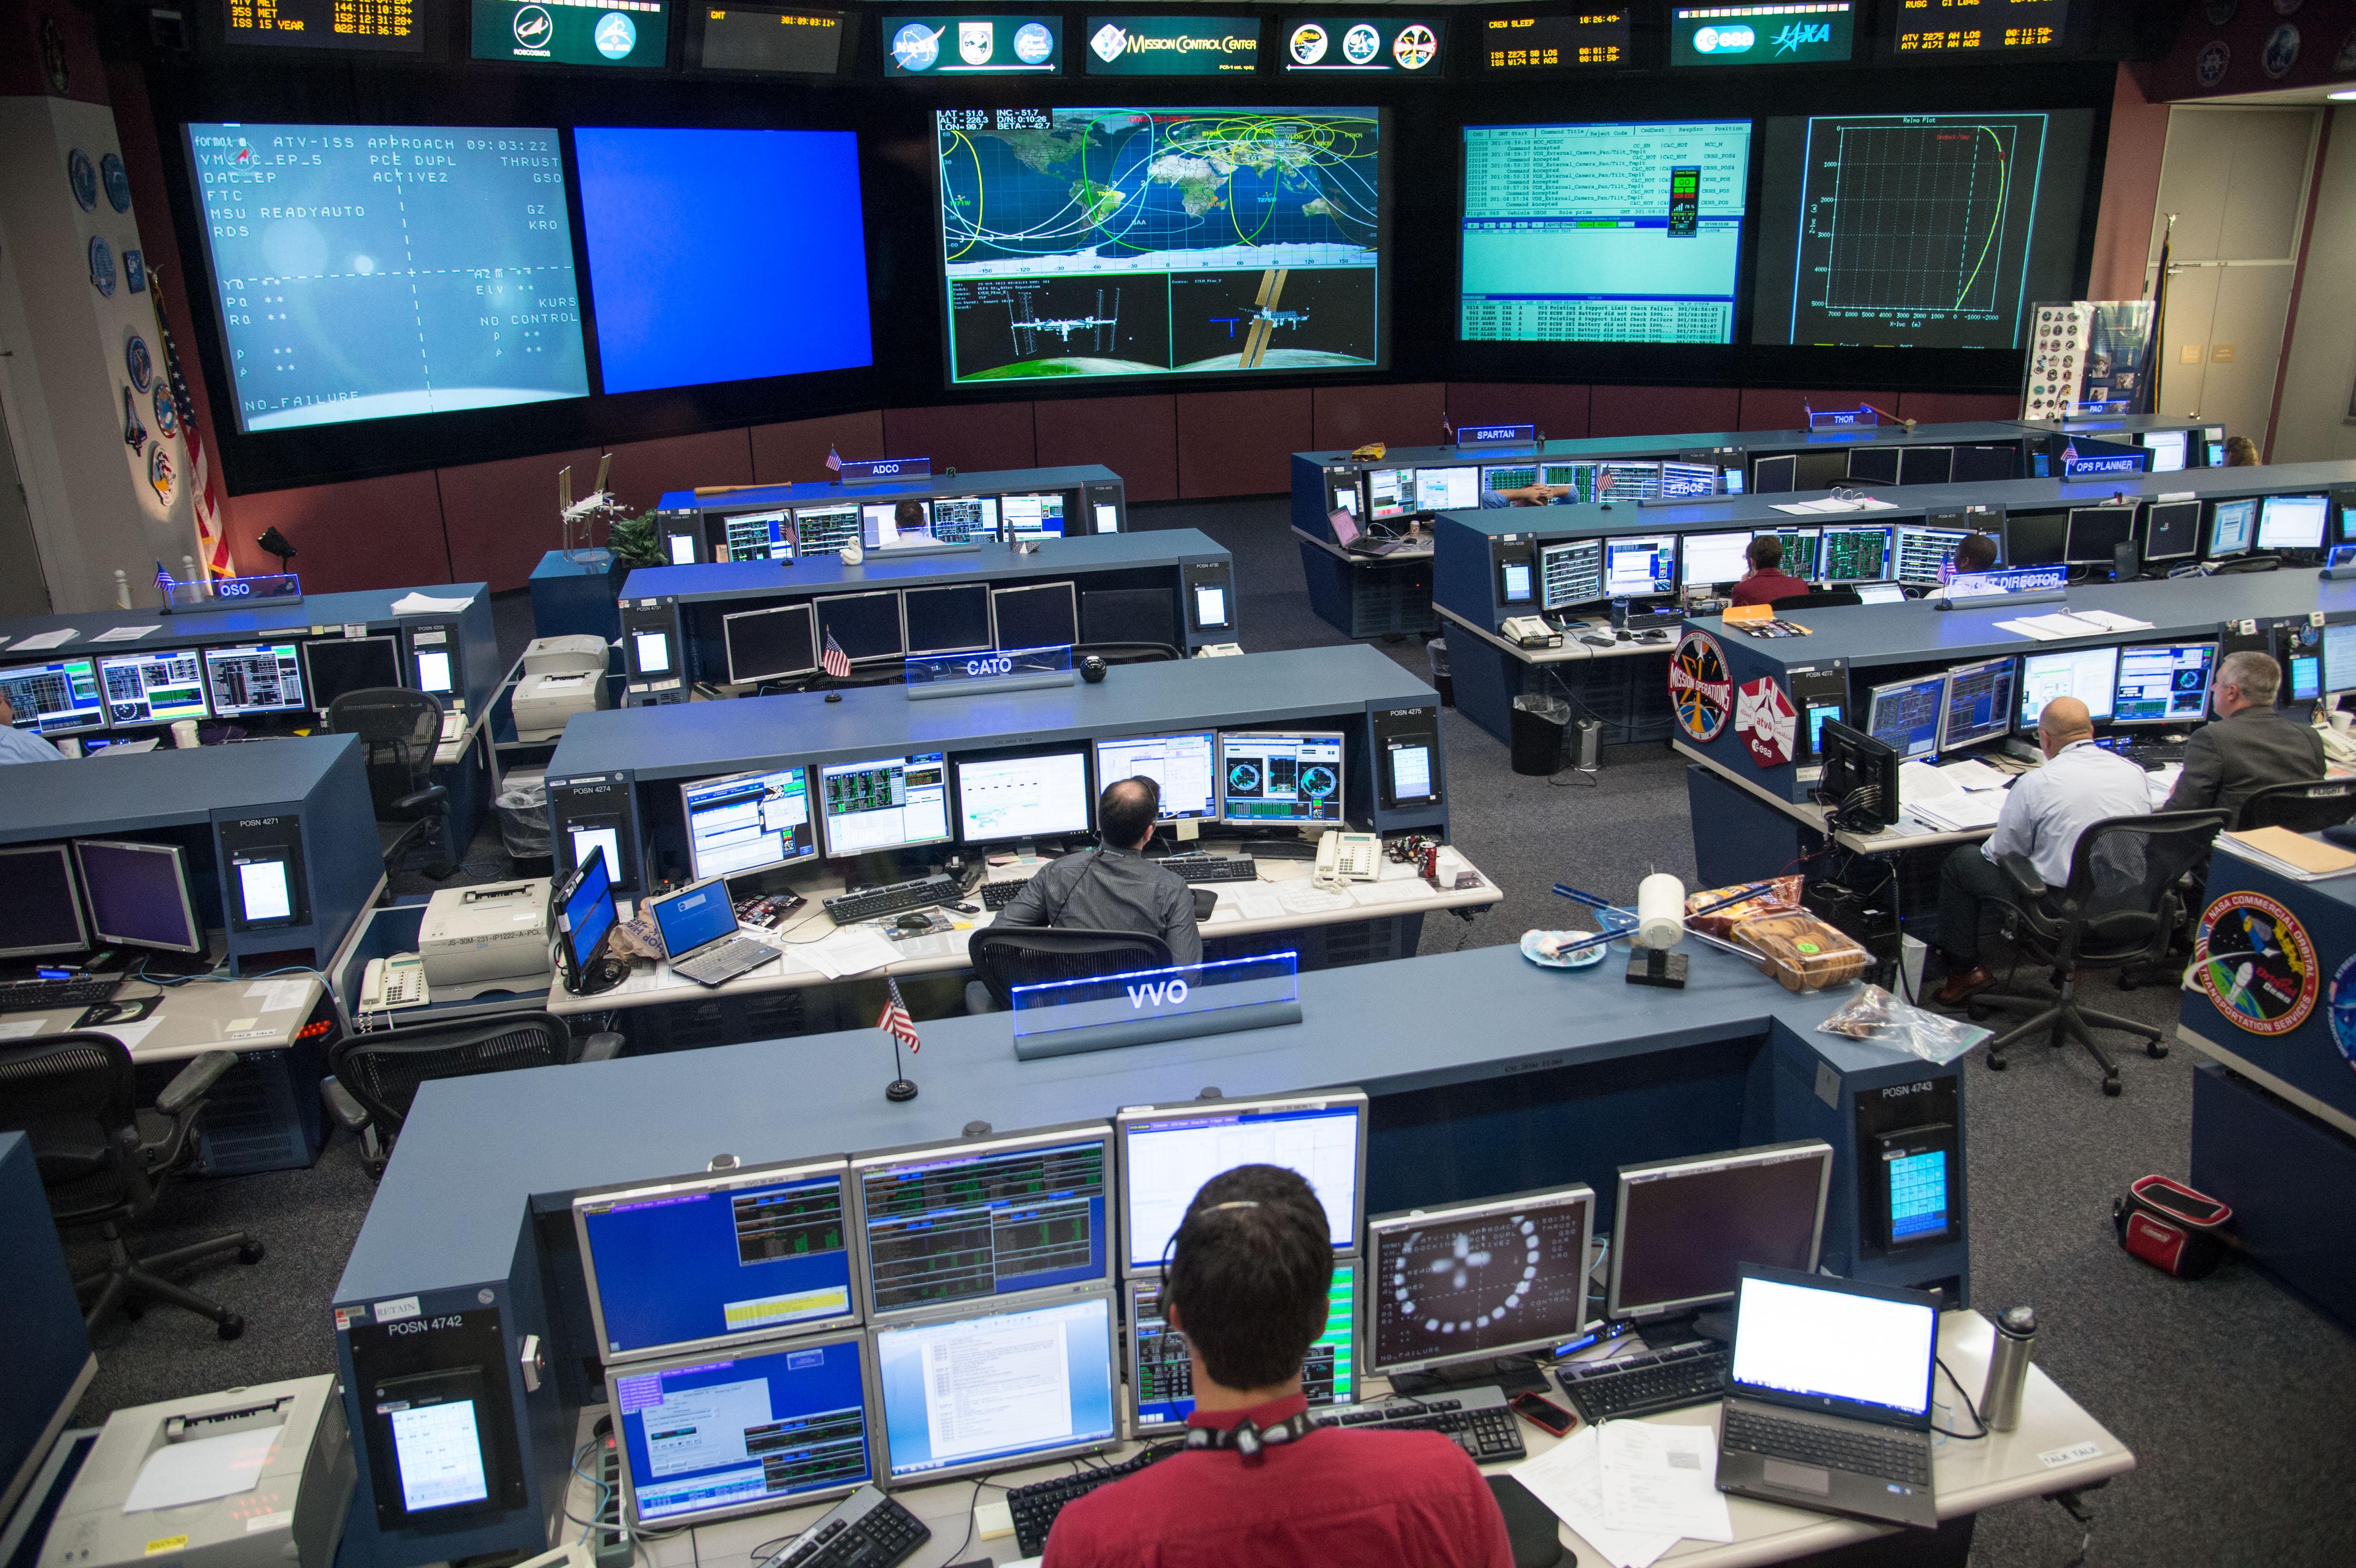 nasa space controls - photo #10